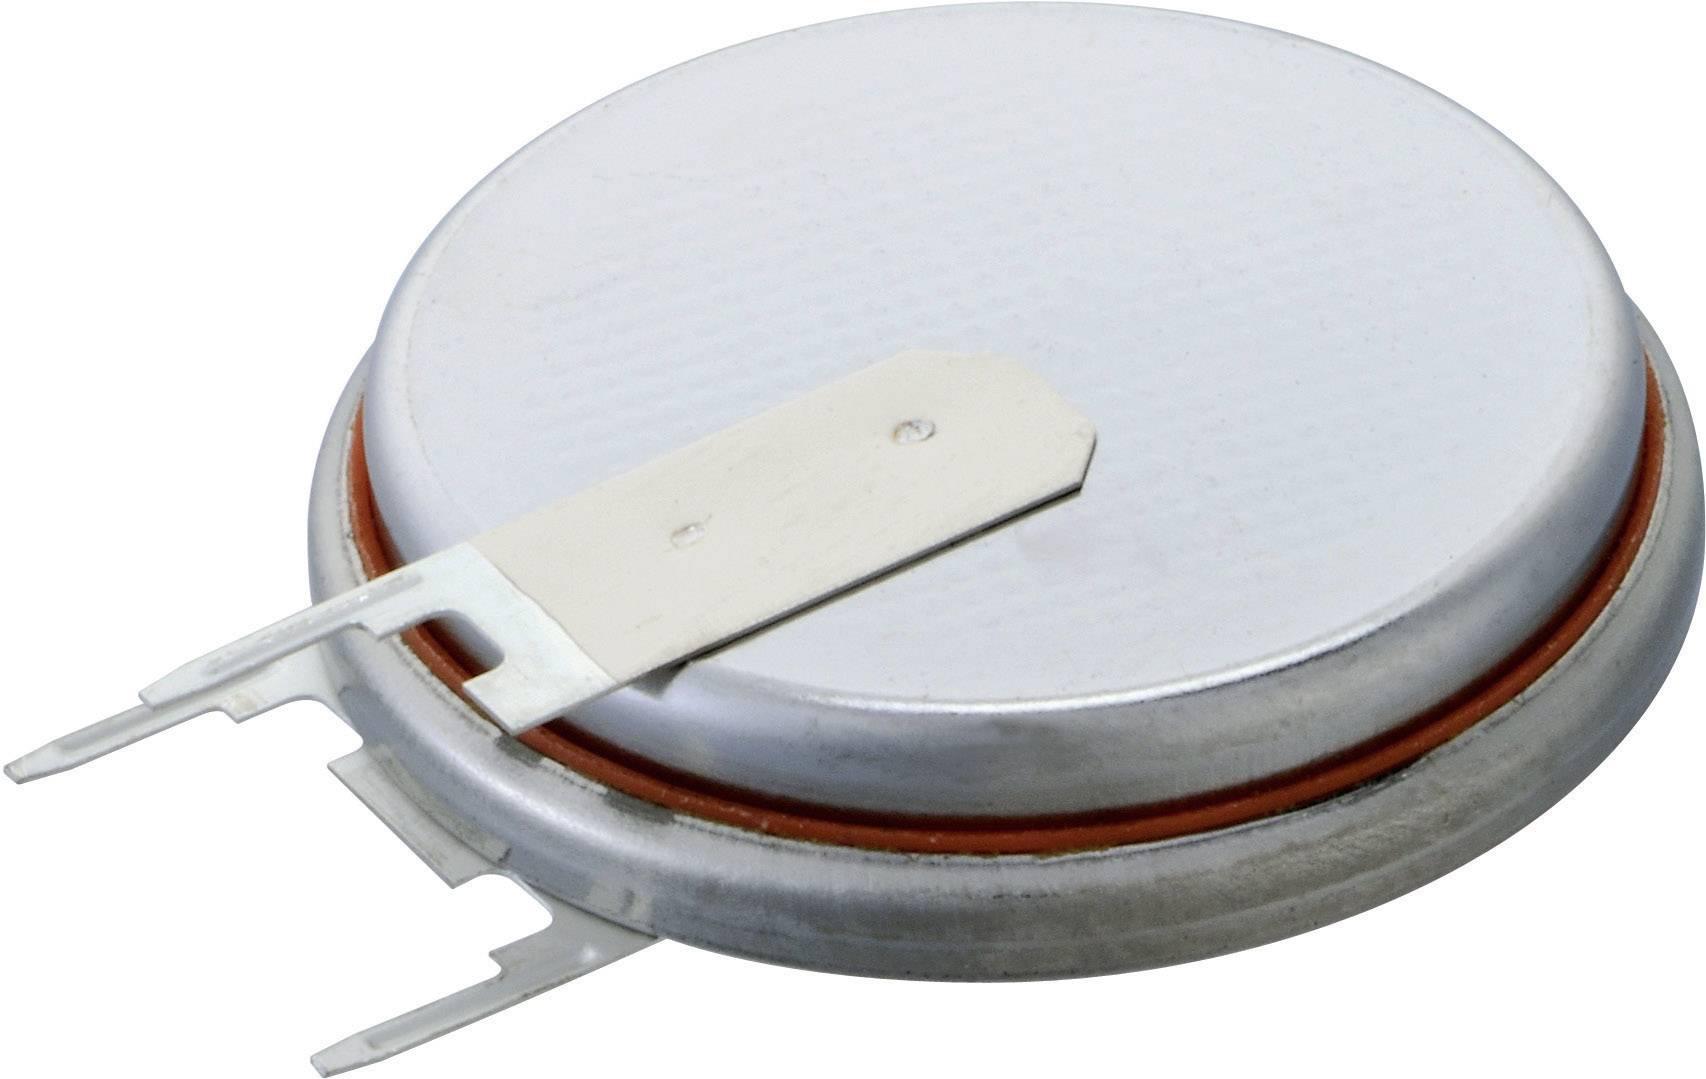 Knoflíková baterie Renata CR2450N RV-LF, s pájecími kontakty